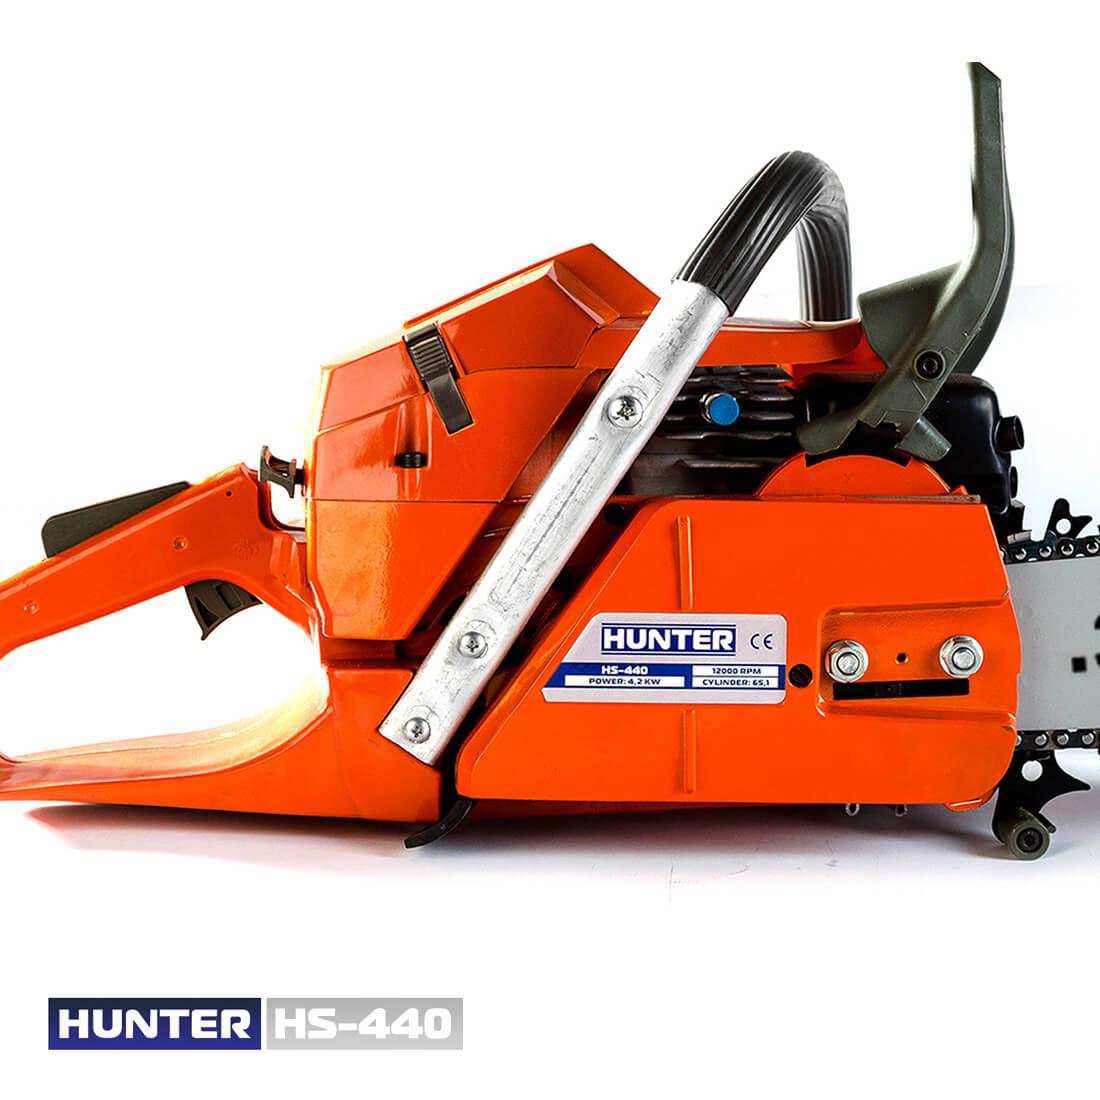 Фото Hunter HS-440 цена 7700грн №5 — Hunter